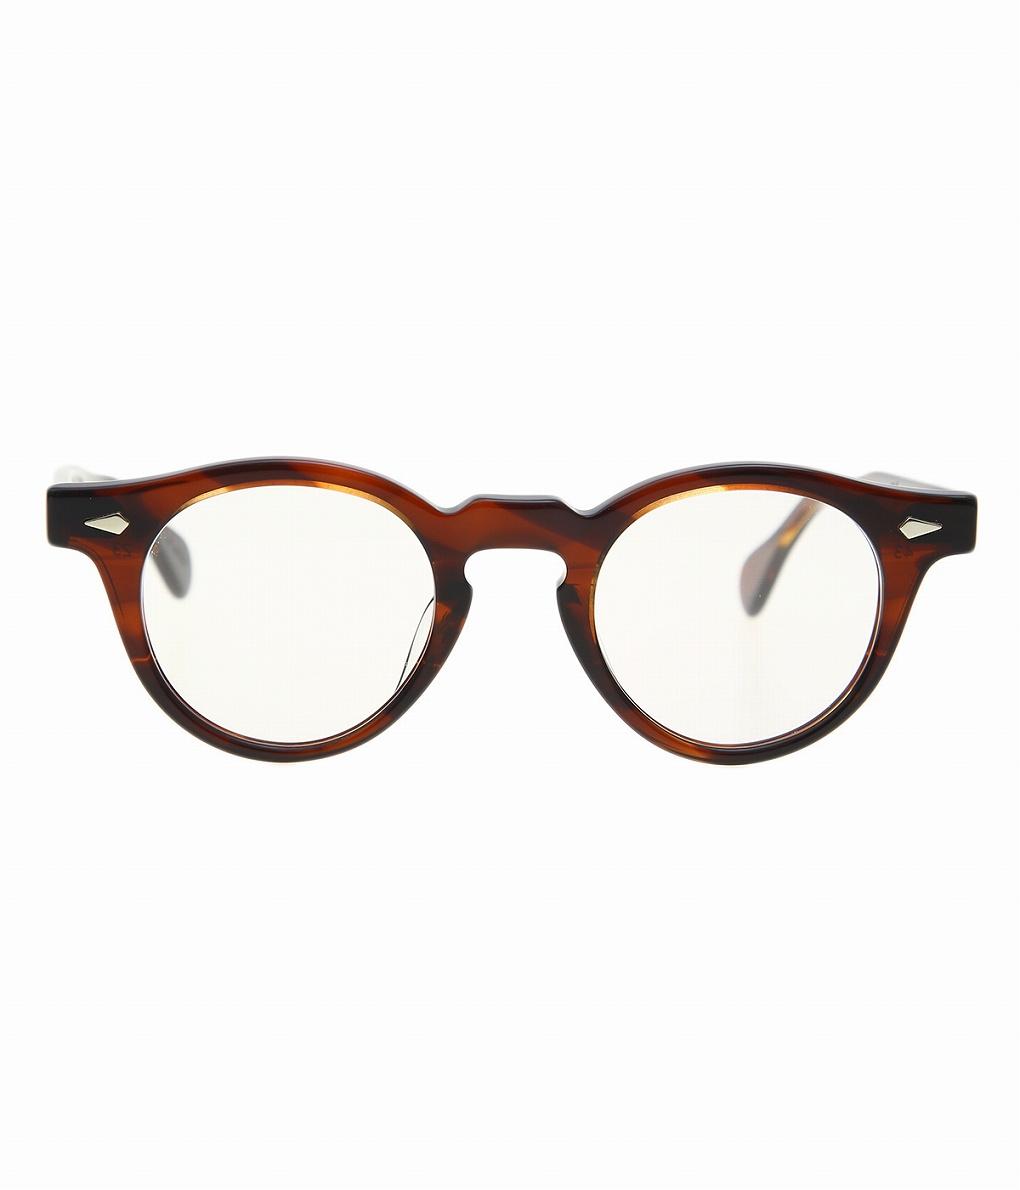 JULIUS TART OPTICAL / ジュリアスタートオプティカル : HAROLD 43(size) 45(size) -DEMI CLEAR / CR39- : サングラス アクセサリー メガネ 眼鏡 : JTPL-021M-022M 【COR】